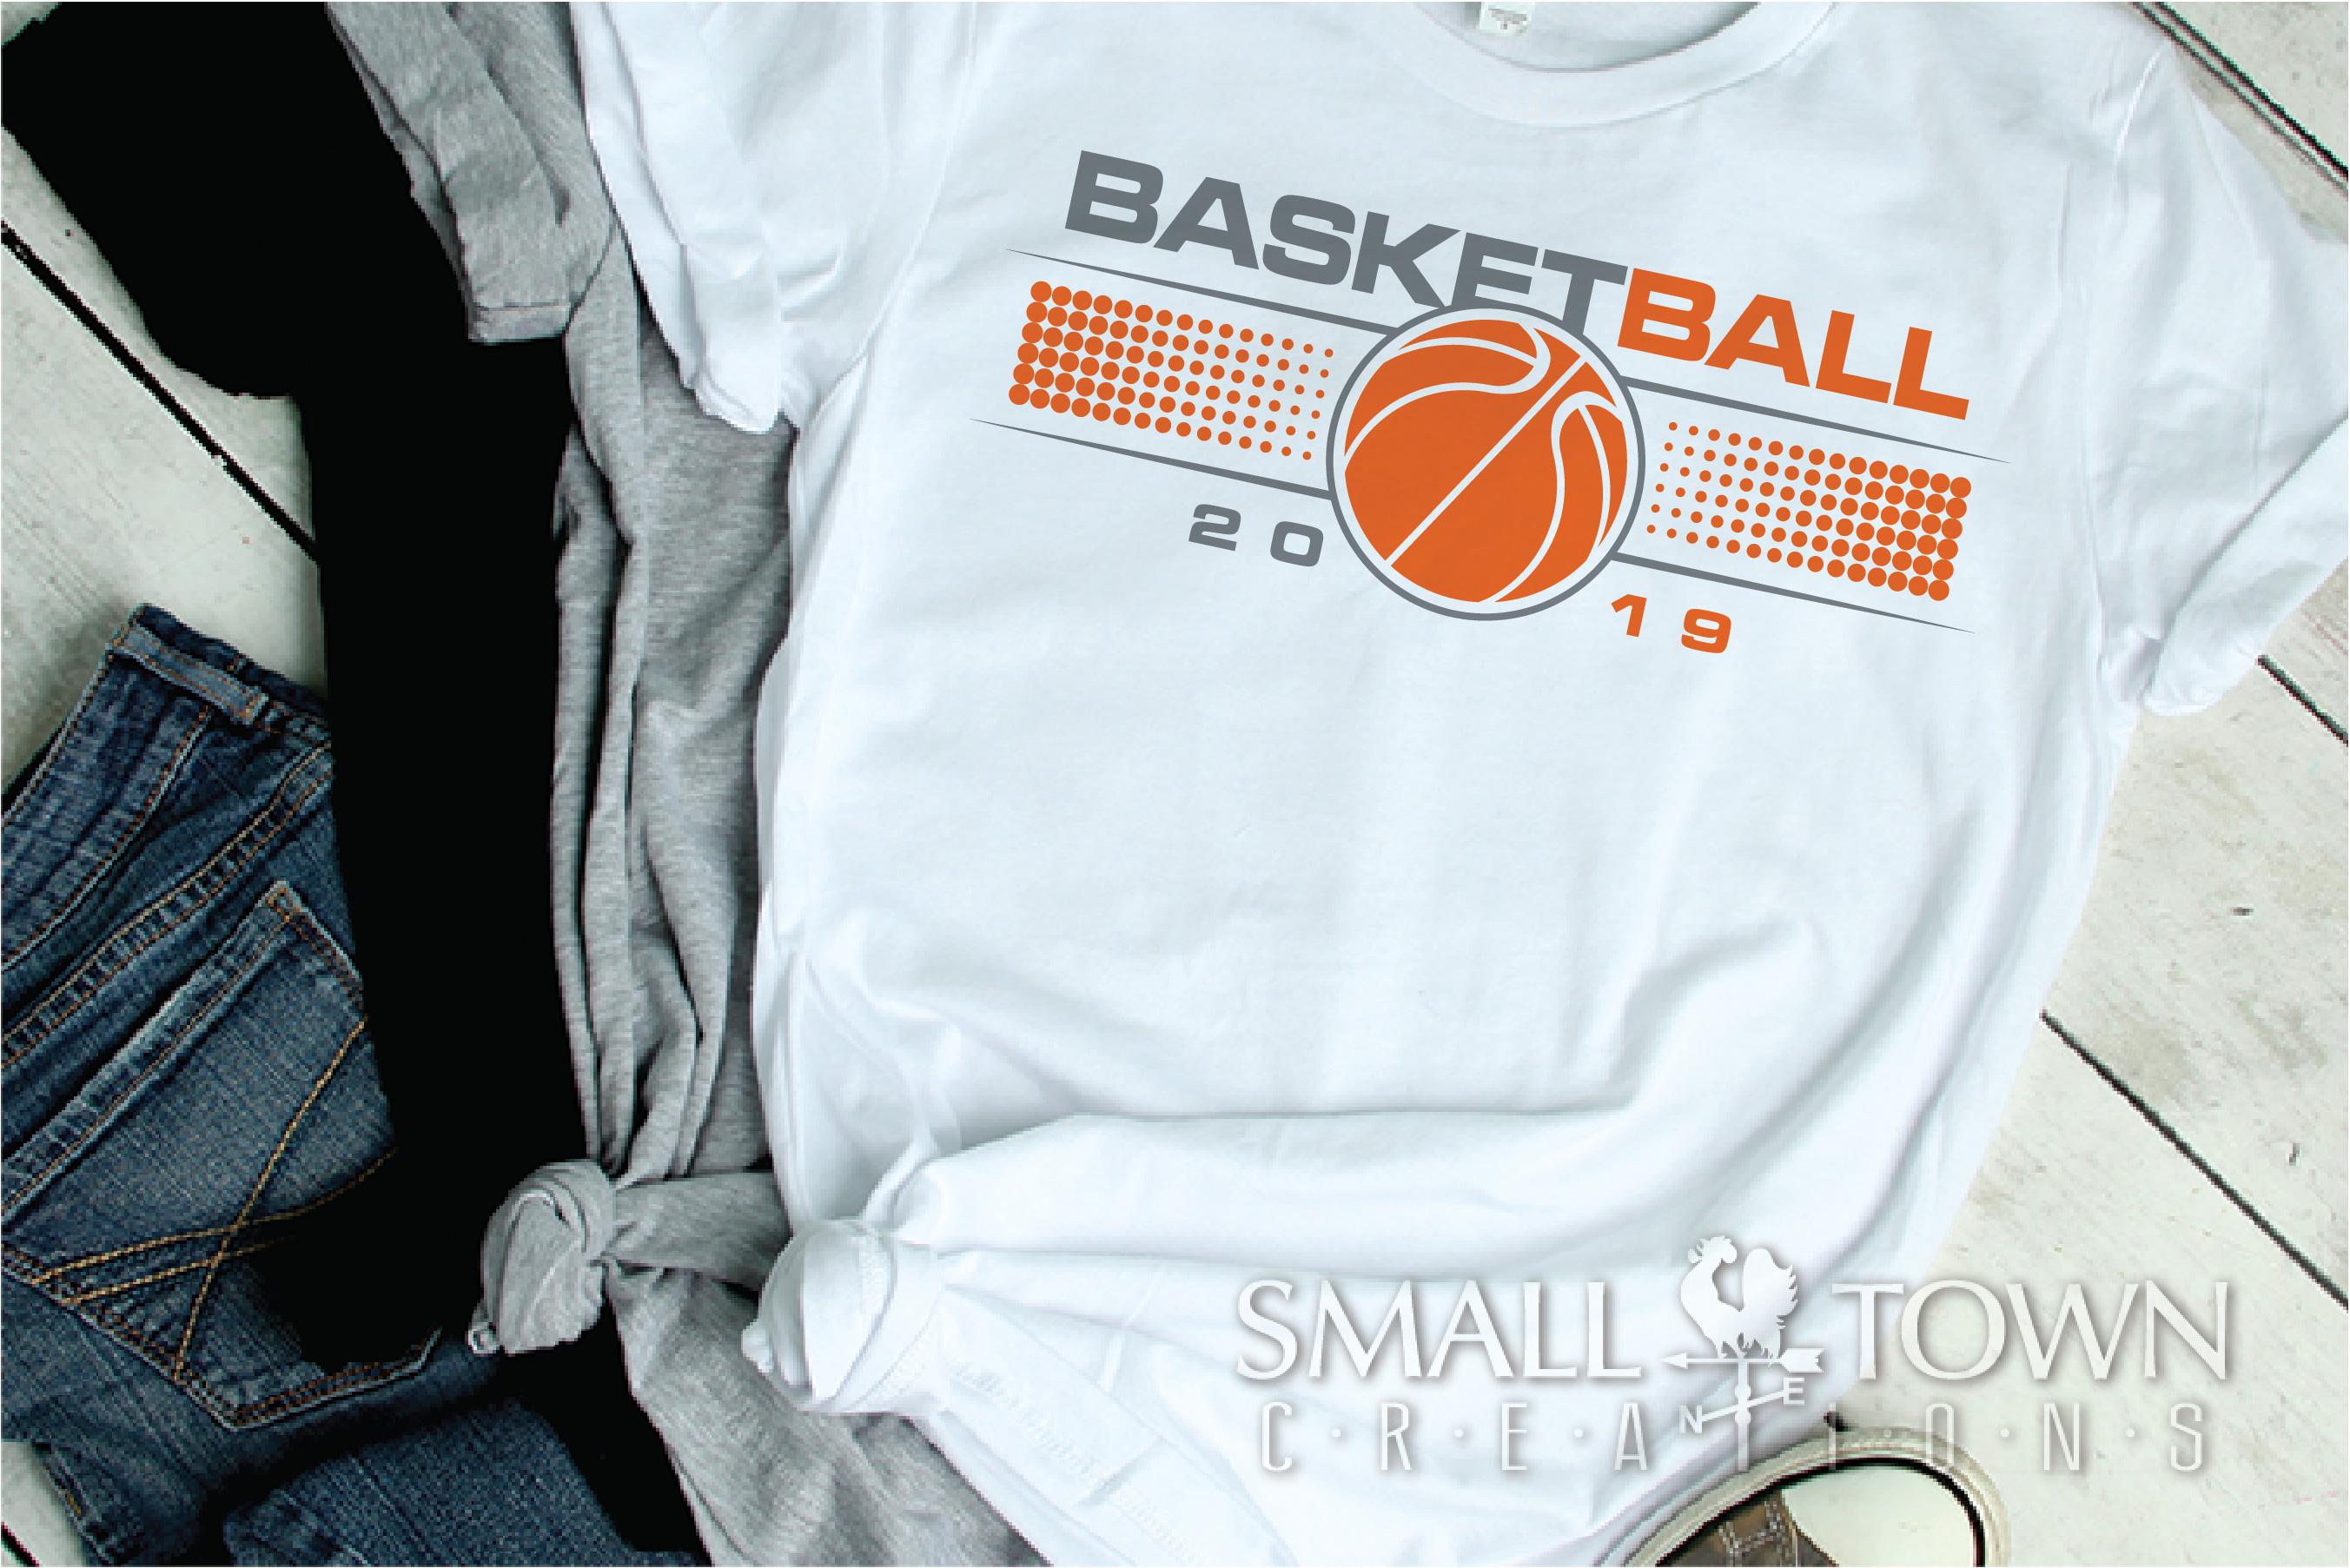 Basketball, Sports ball, sport team logo, PRINT, CUT, DESIGN example image 4